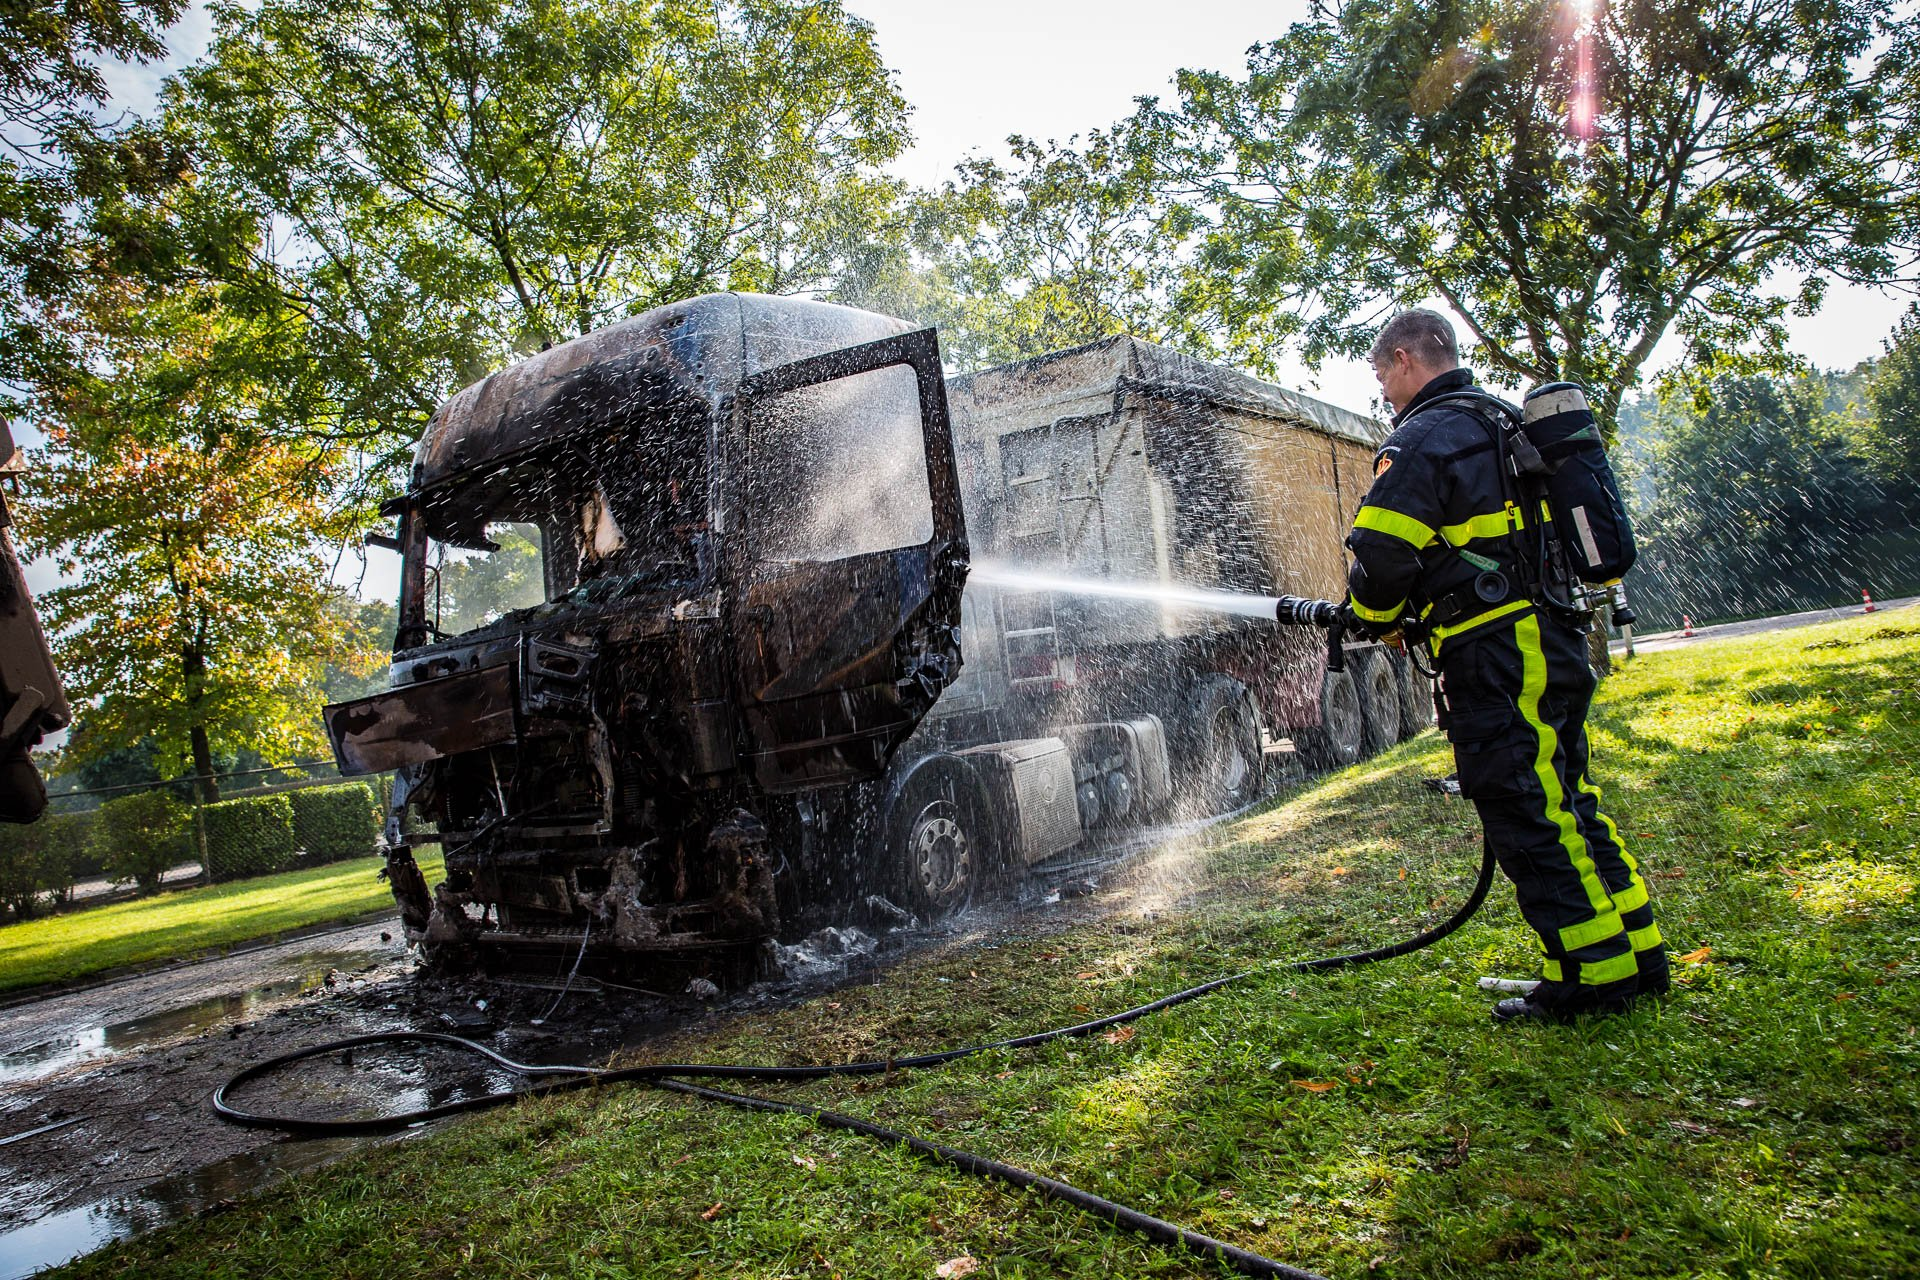 Vrachtwagen uitgebrand op industriegebied Borchwerf